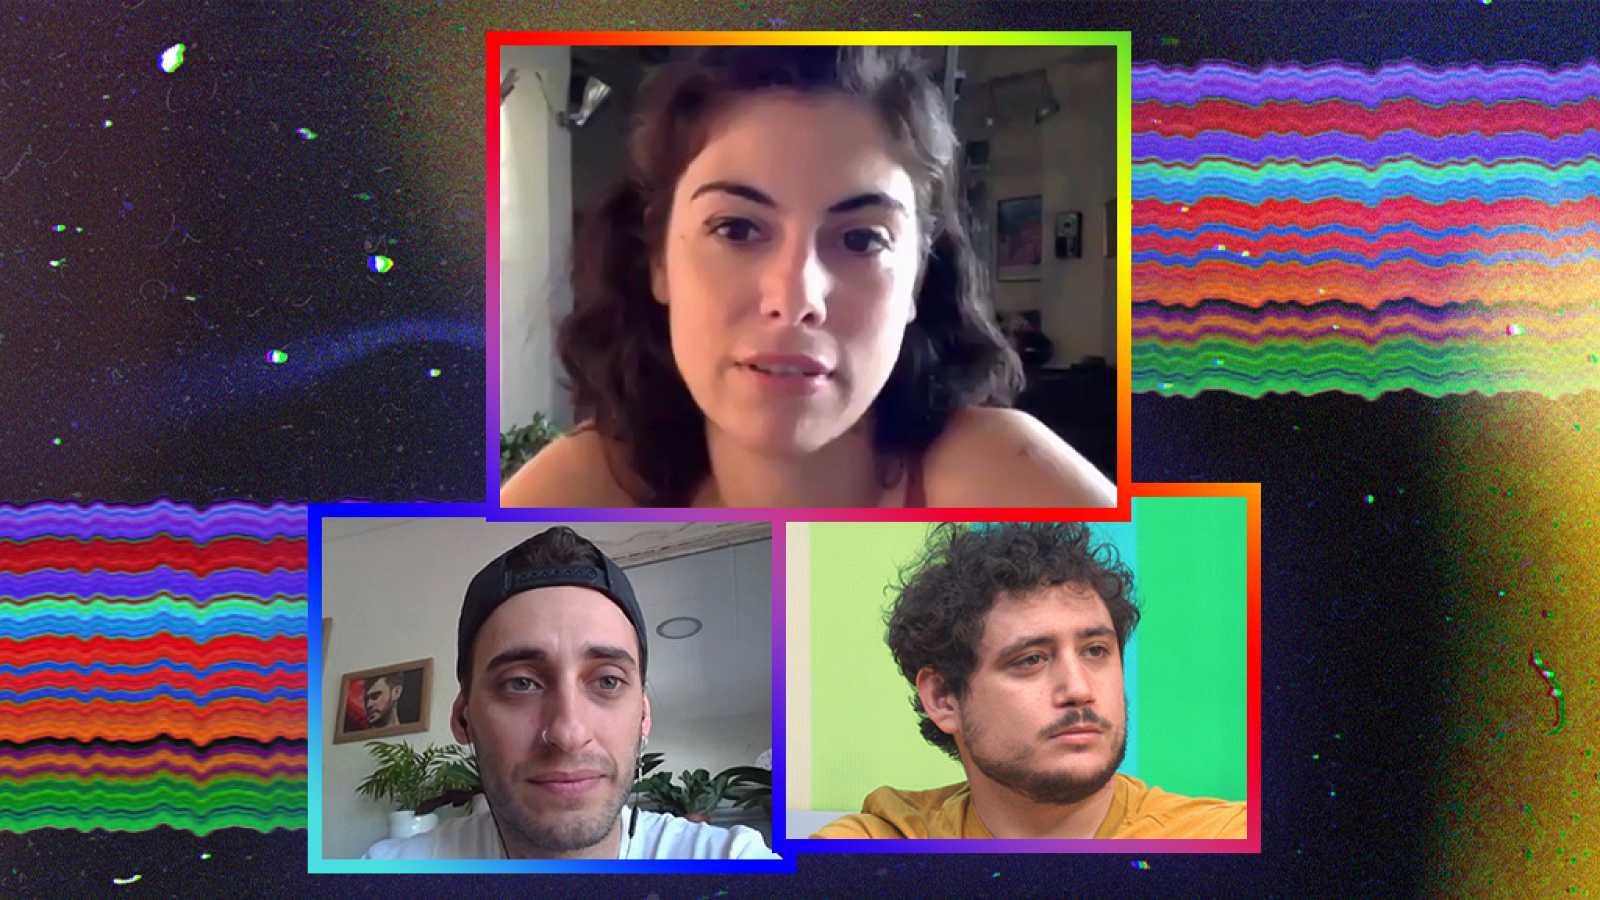 OK Playz - OK Playz con Anabel Lorente, Blon y Darío Eme Hache